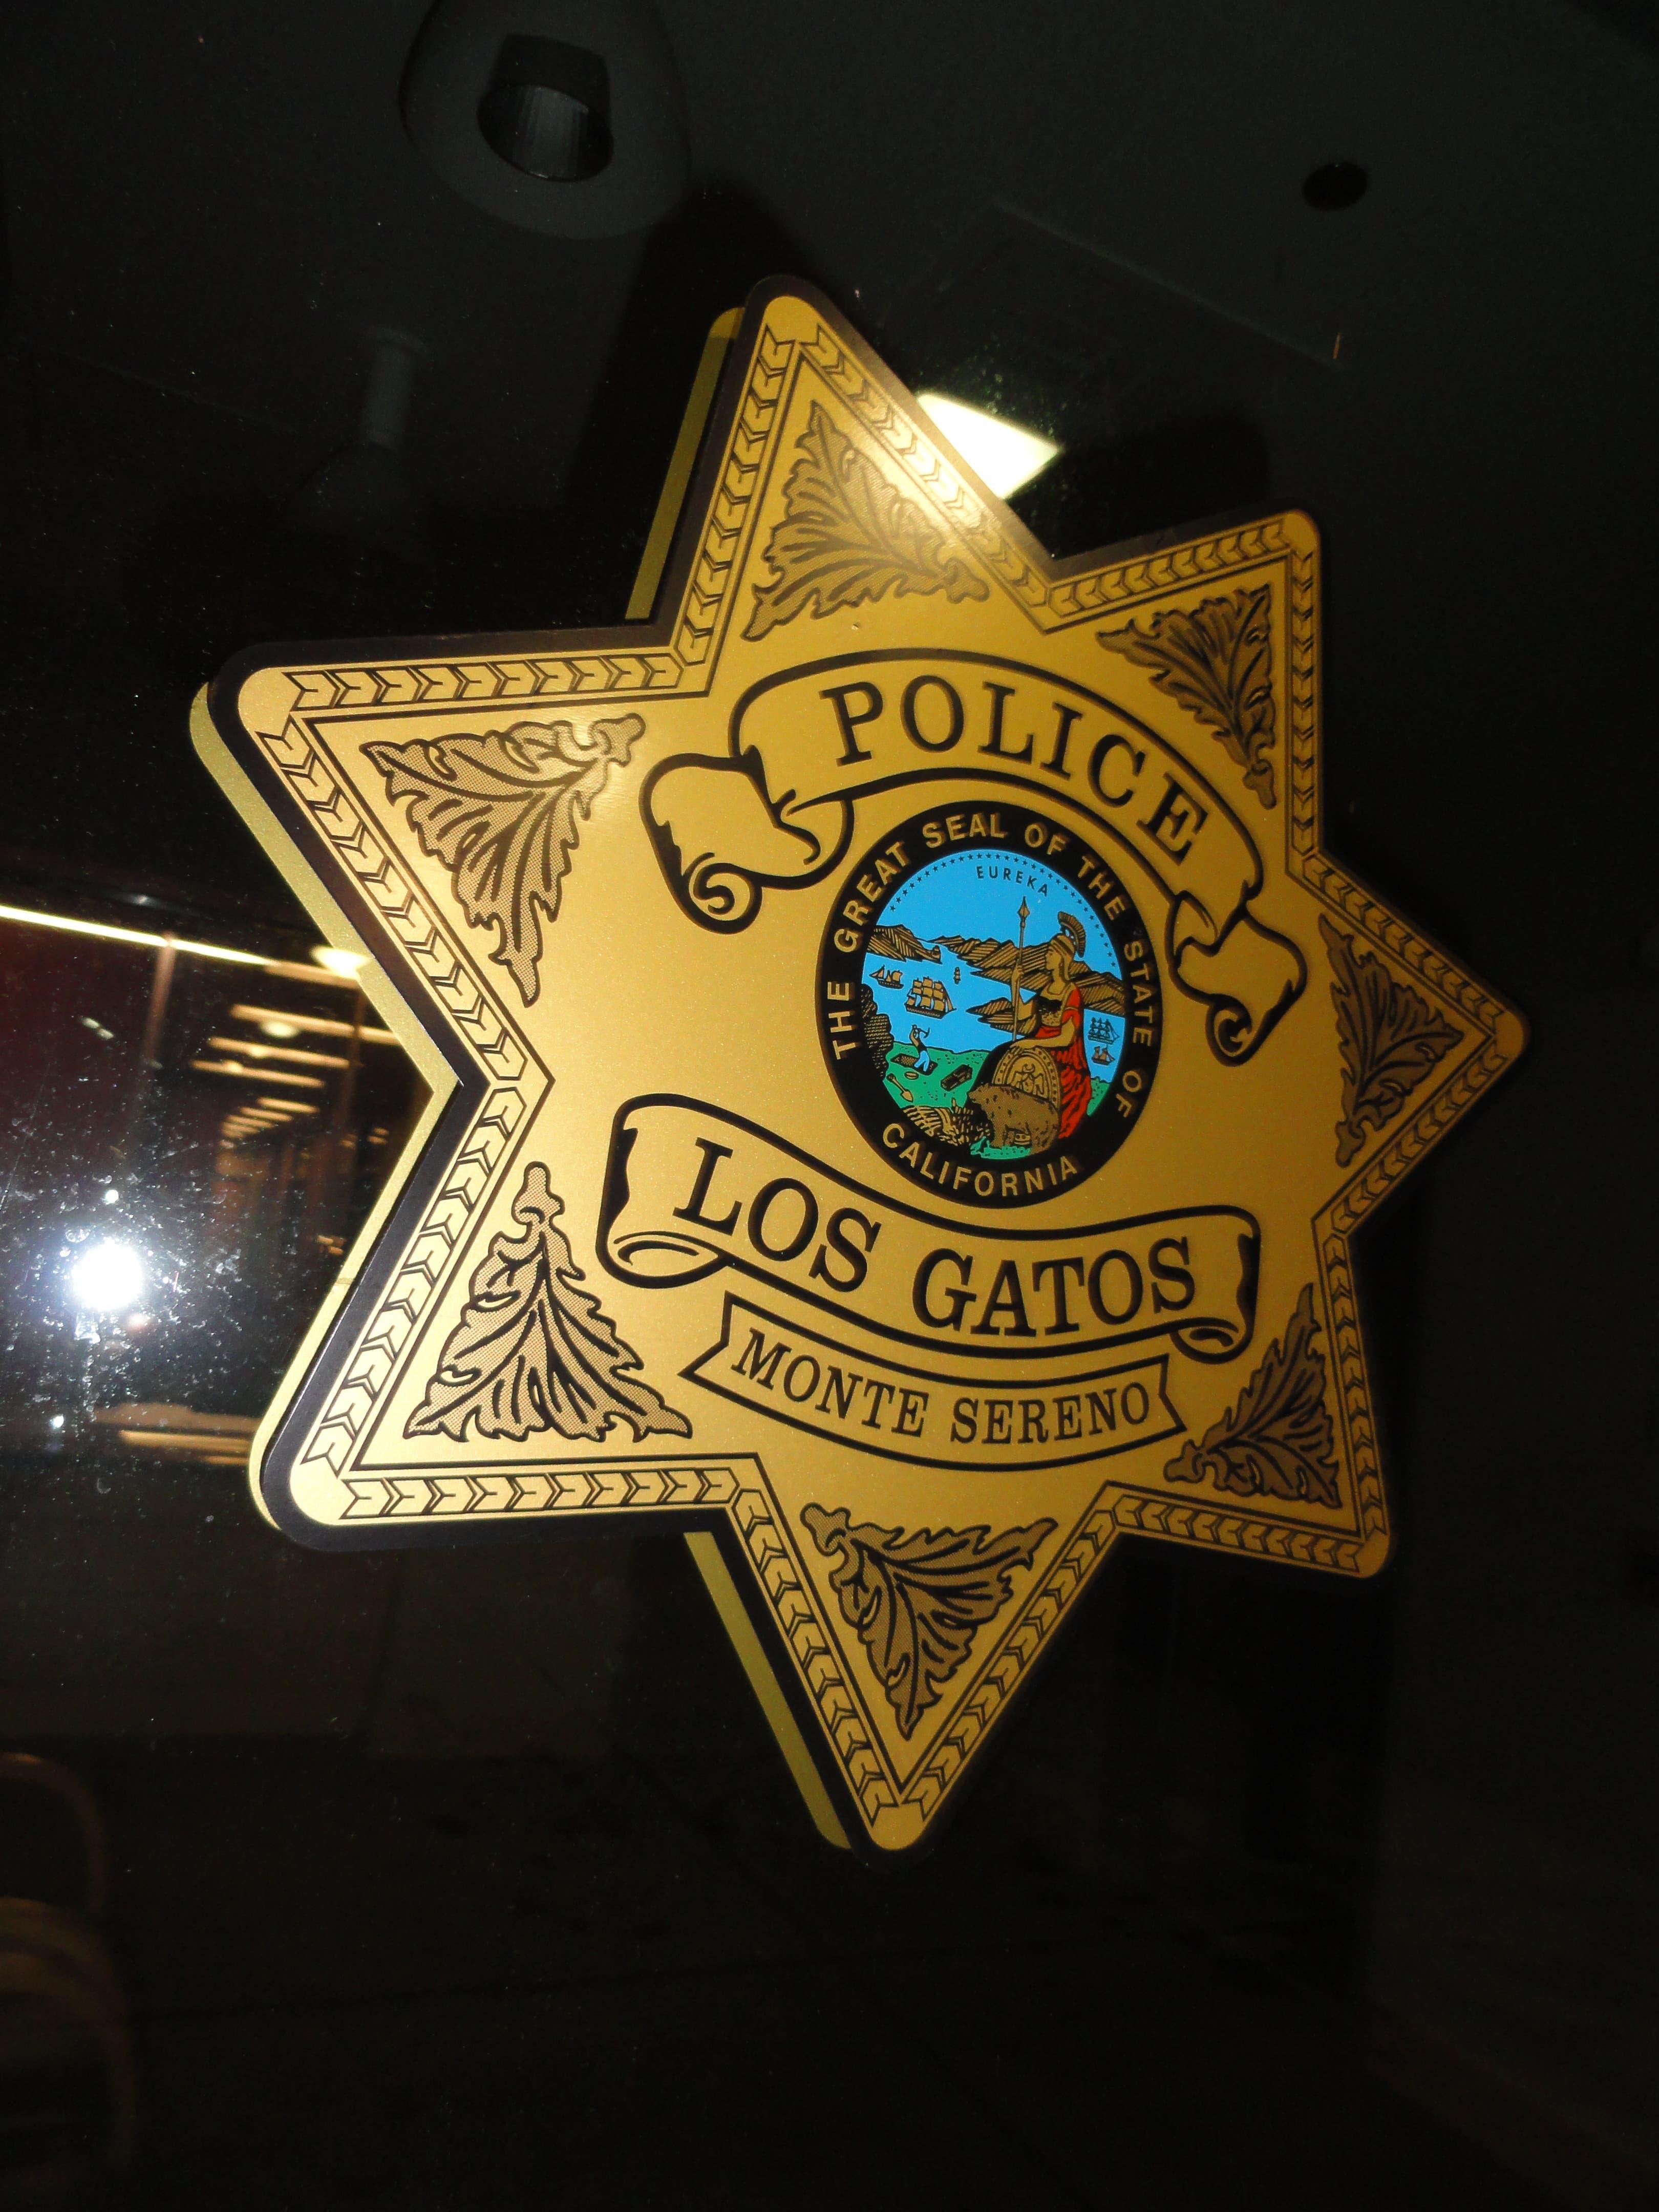 Updated: Identity of Monte Sereno/Highway 9 Crash Victim Released